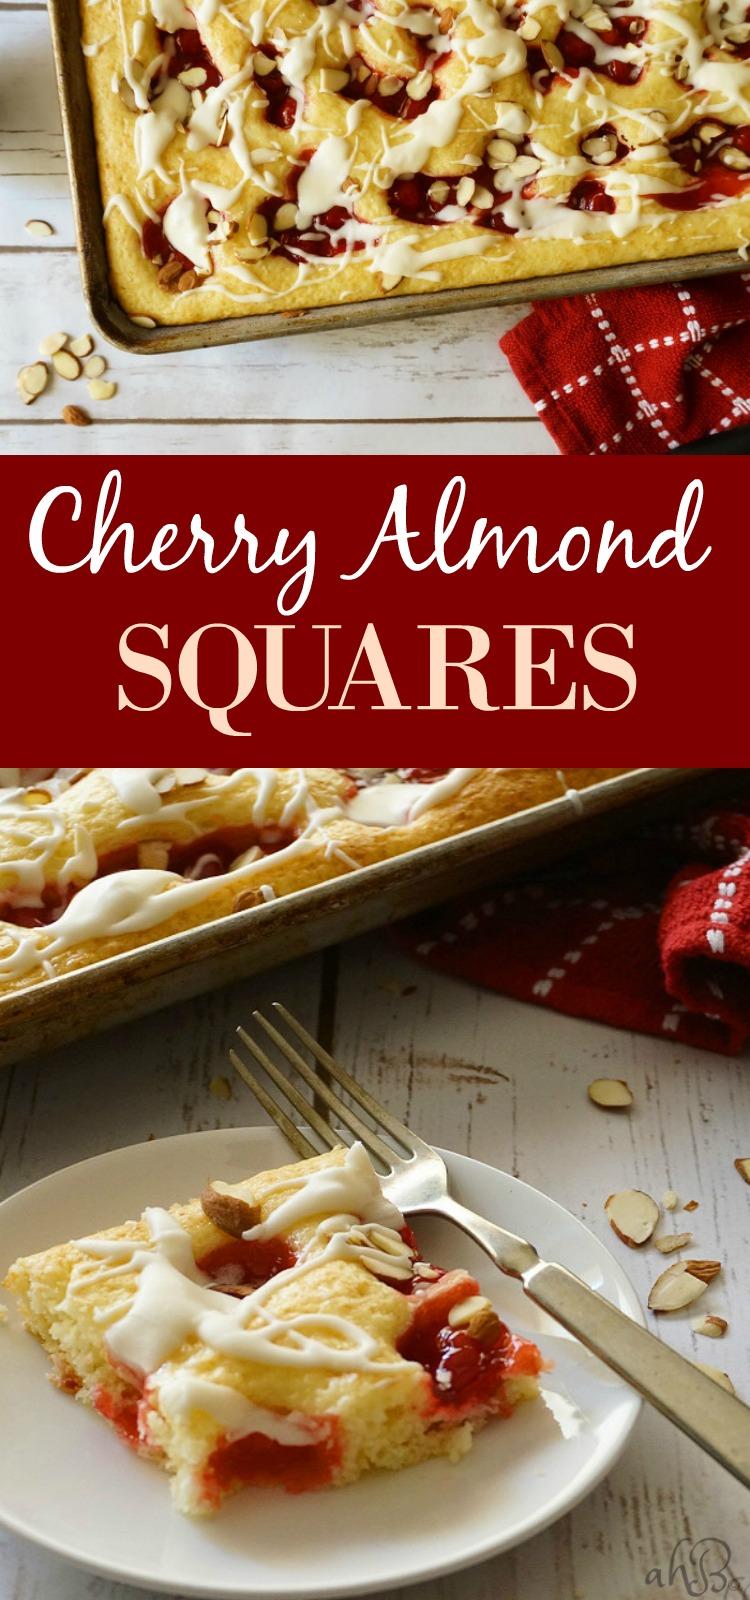 Cherry Almond Squares